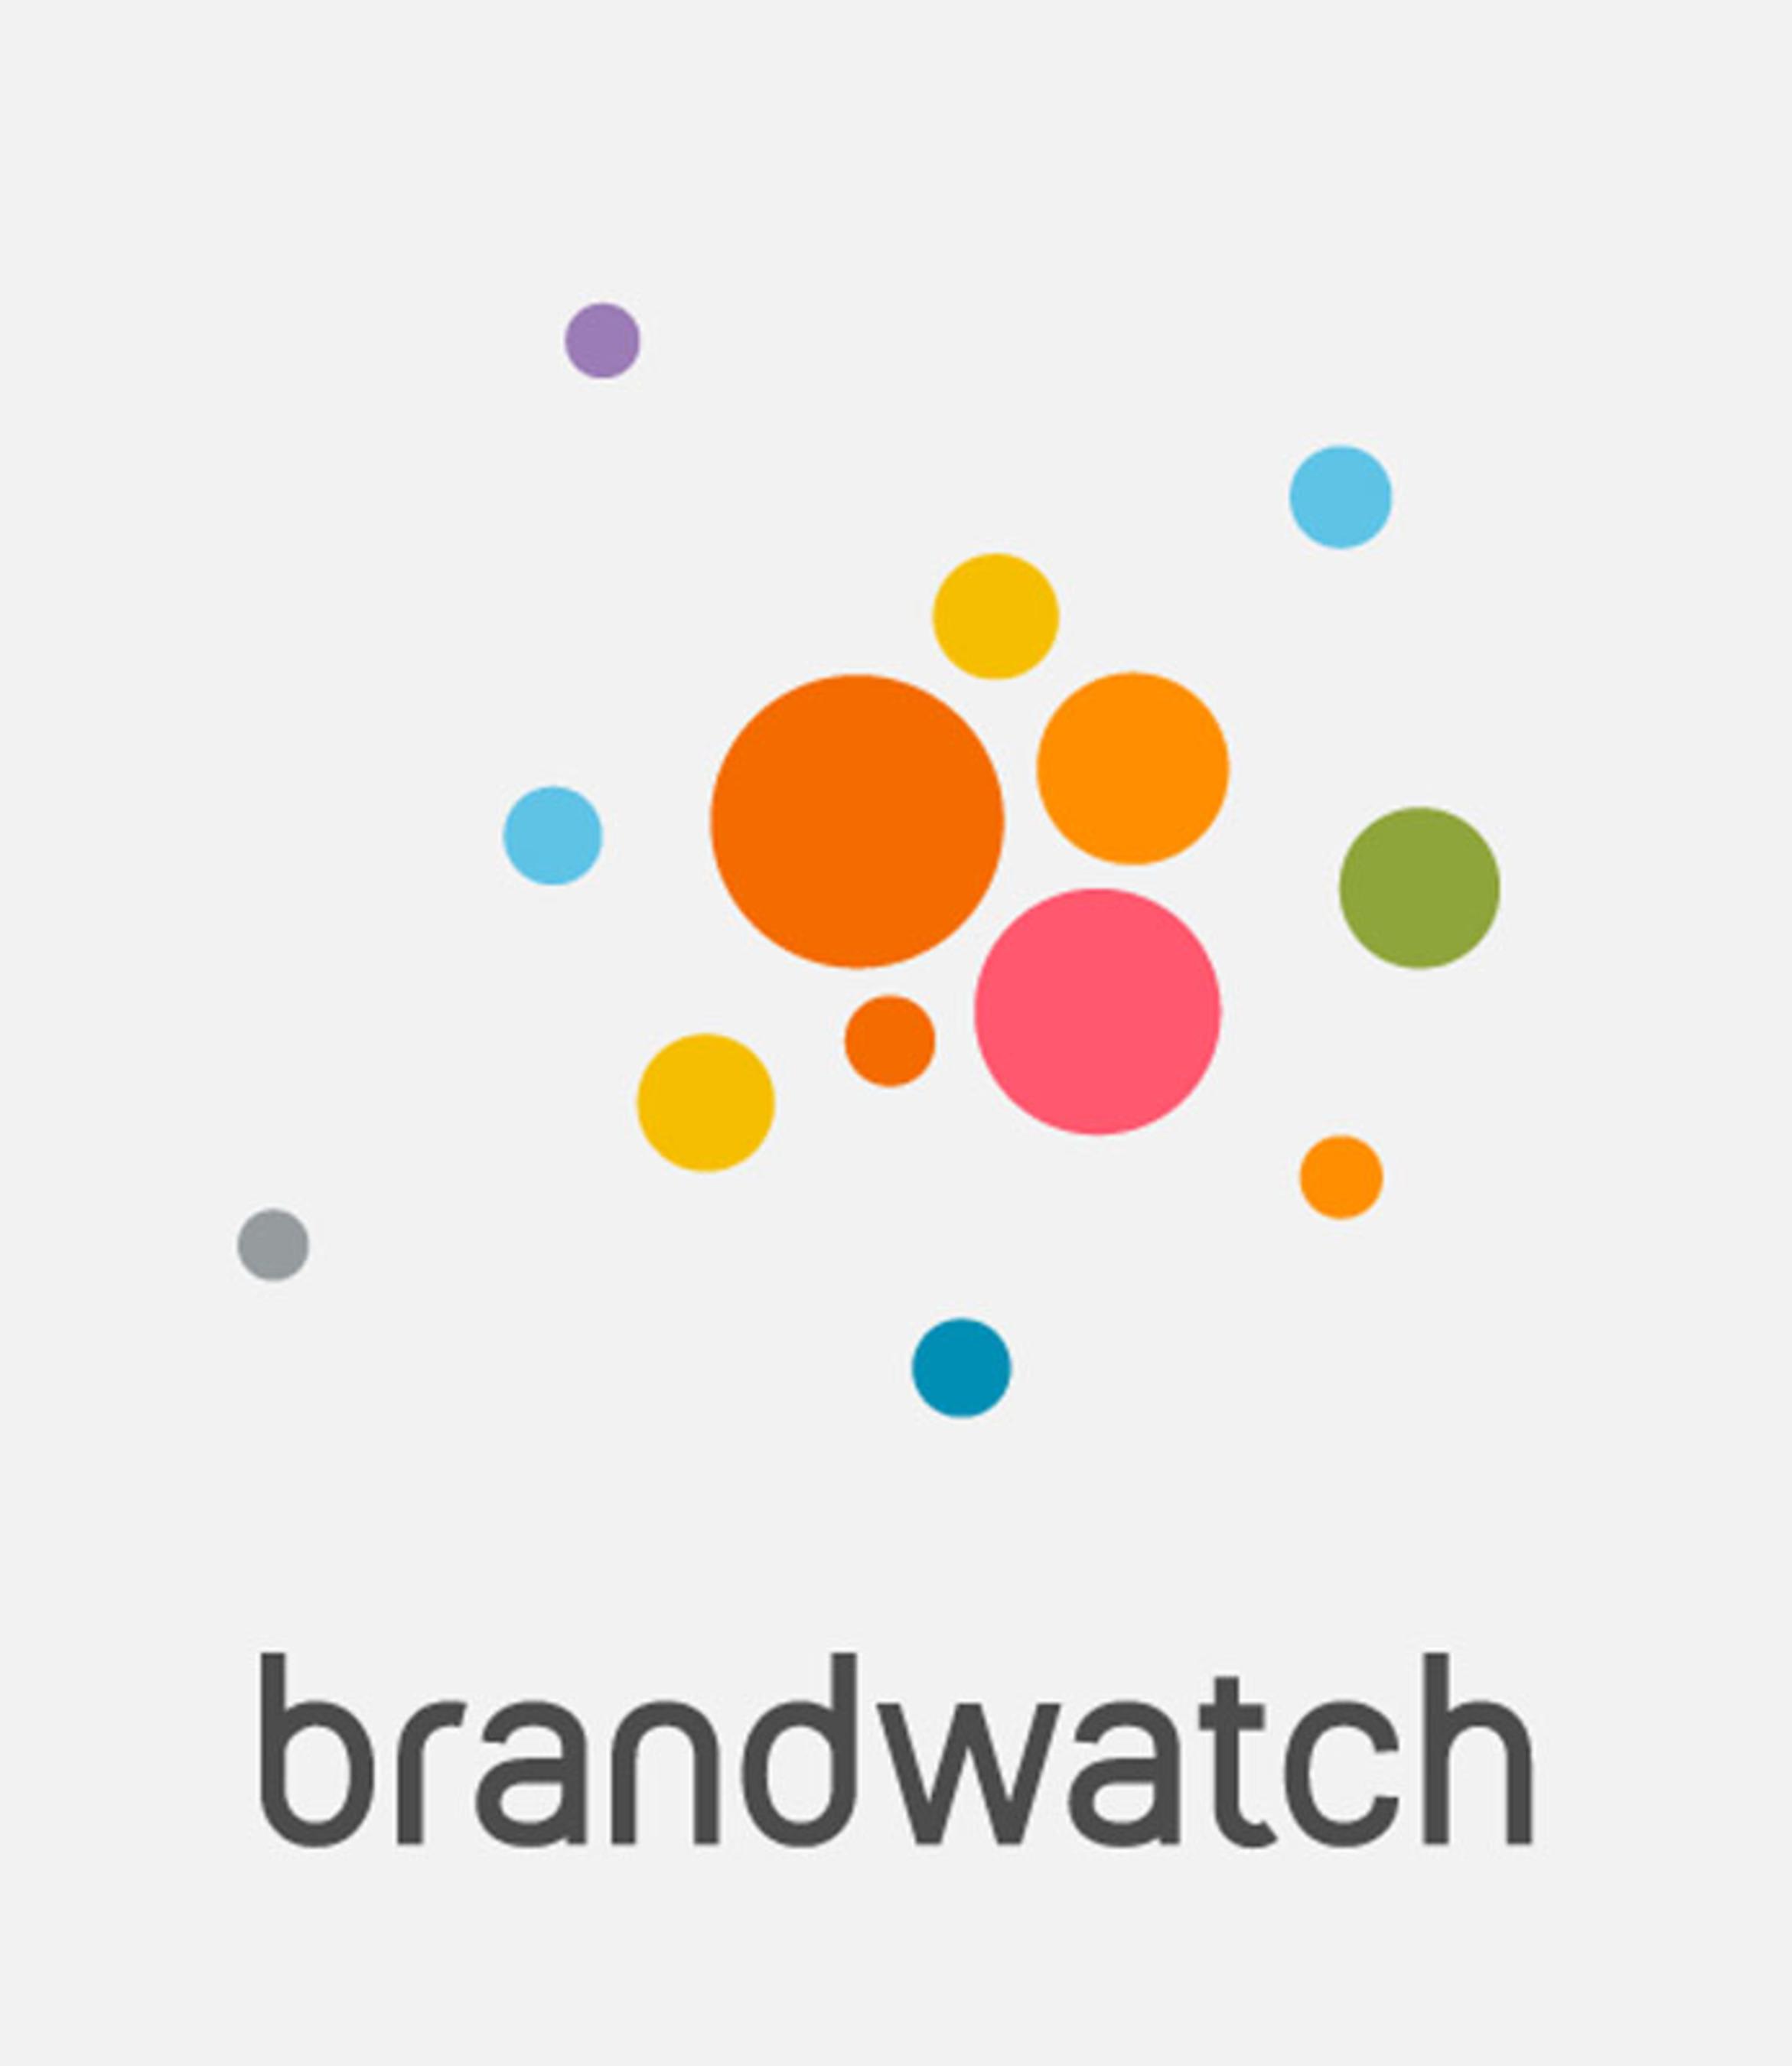 Brandwatch social intelligence